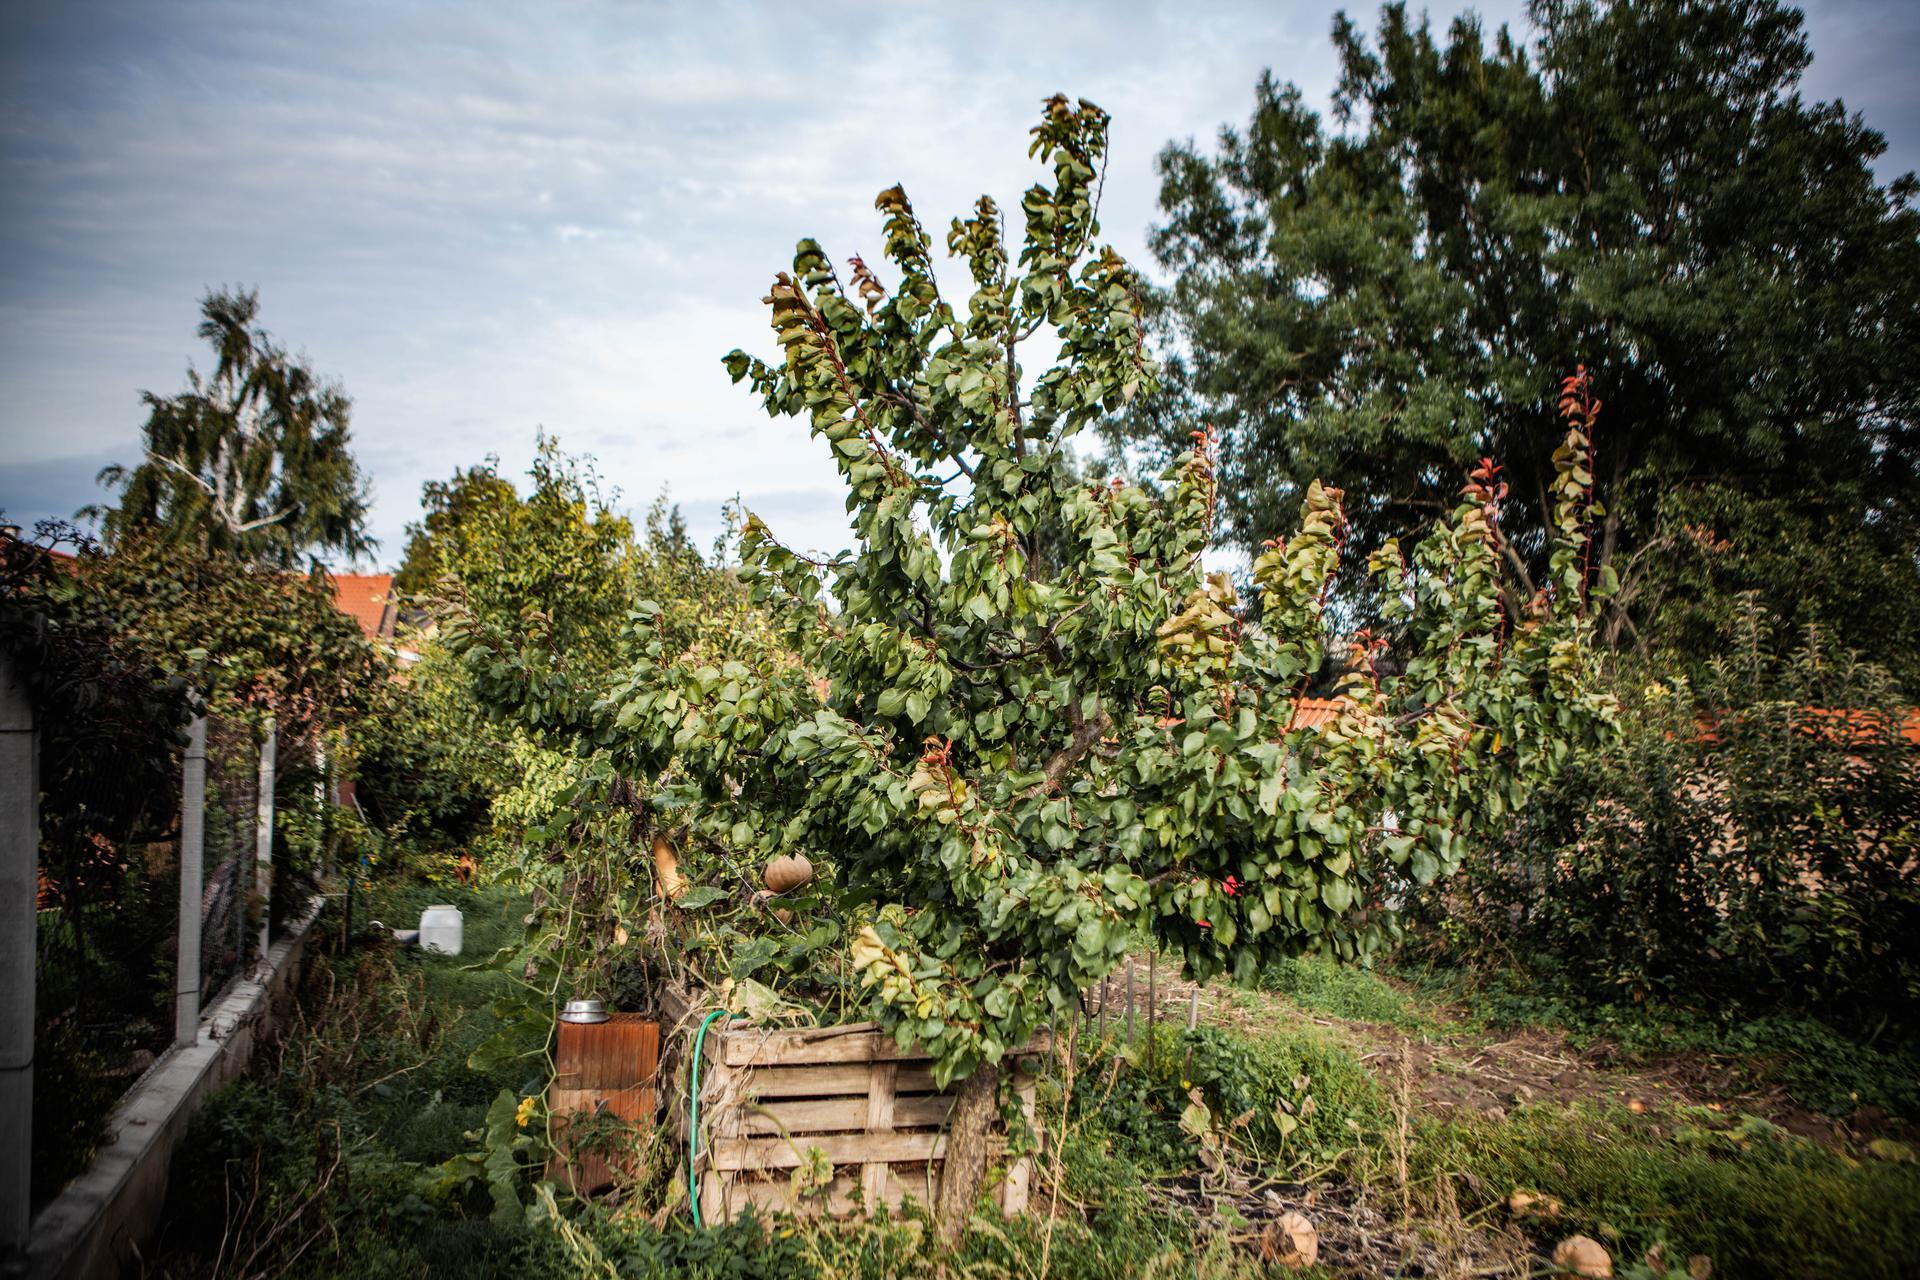 U nas v zahrade v roku 2020 - oktober - uzitkova cast zahrady. na zber cakaju uz len tekvice